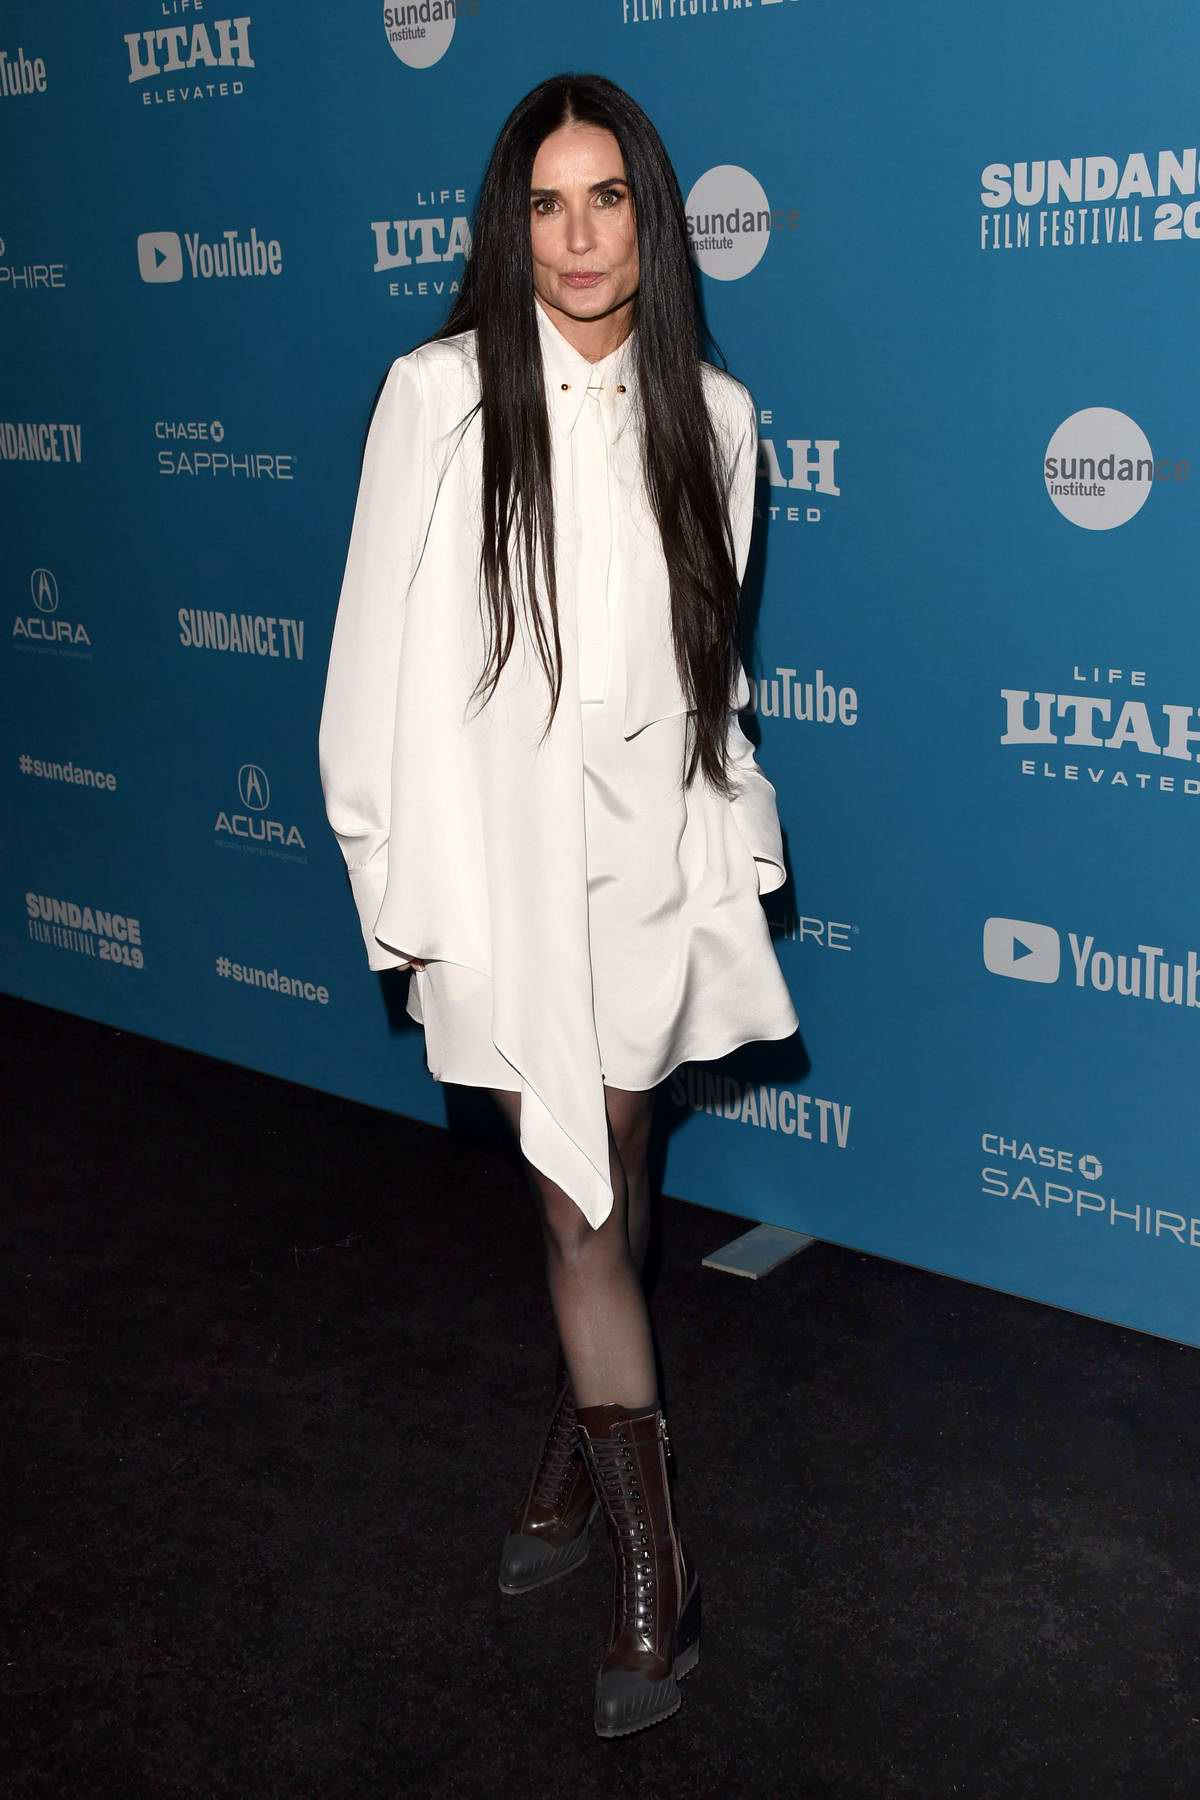 Demi Moore attends 'Corporate Animals' Premiere during 2019 Sundance Film Festival in Park City, Utah